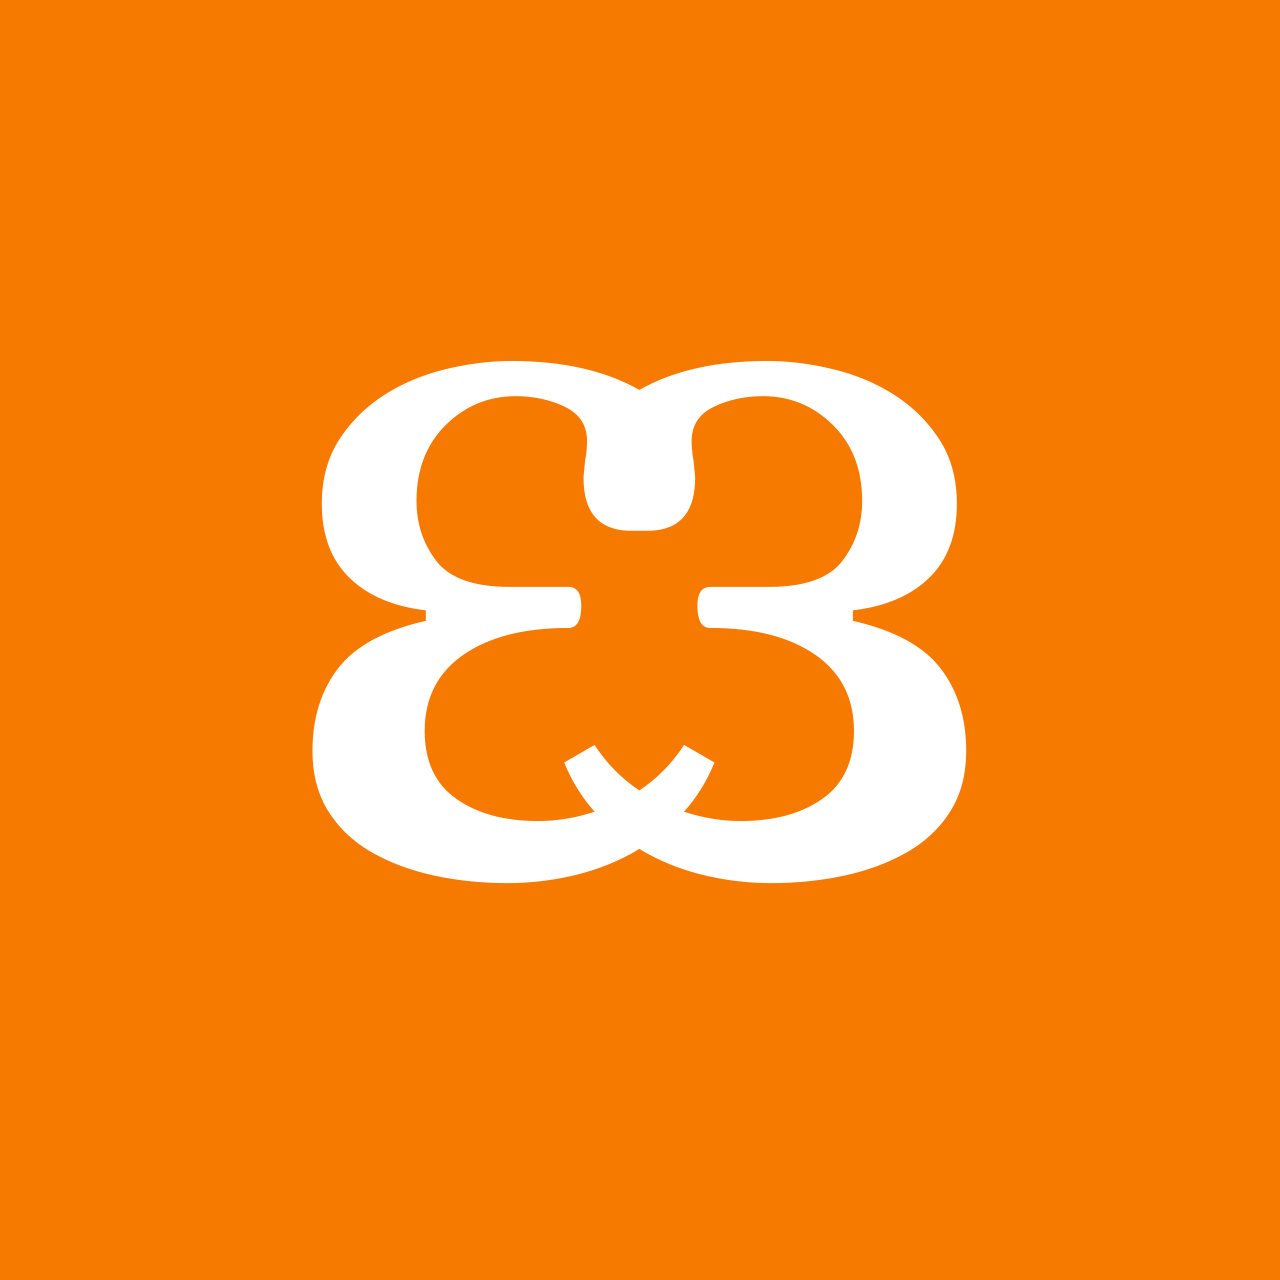 bumm_logo_bildmarke